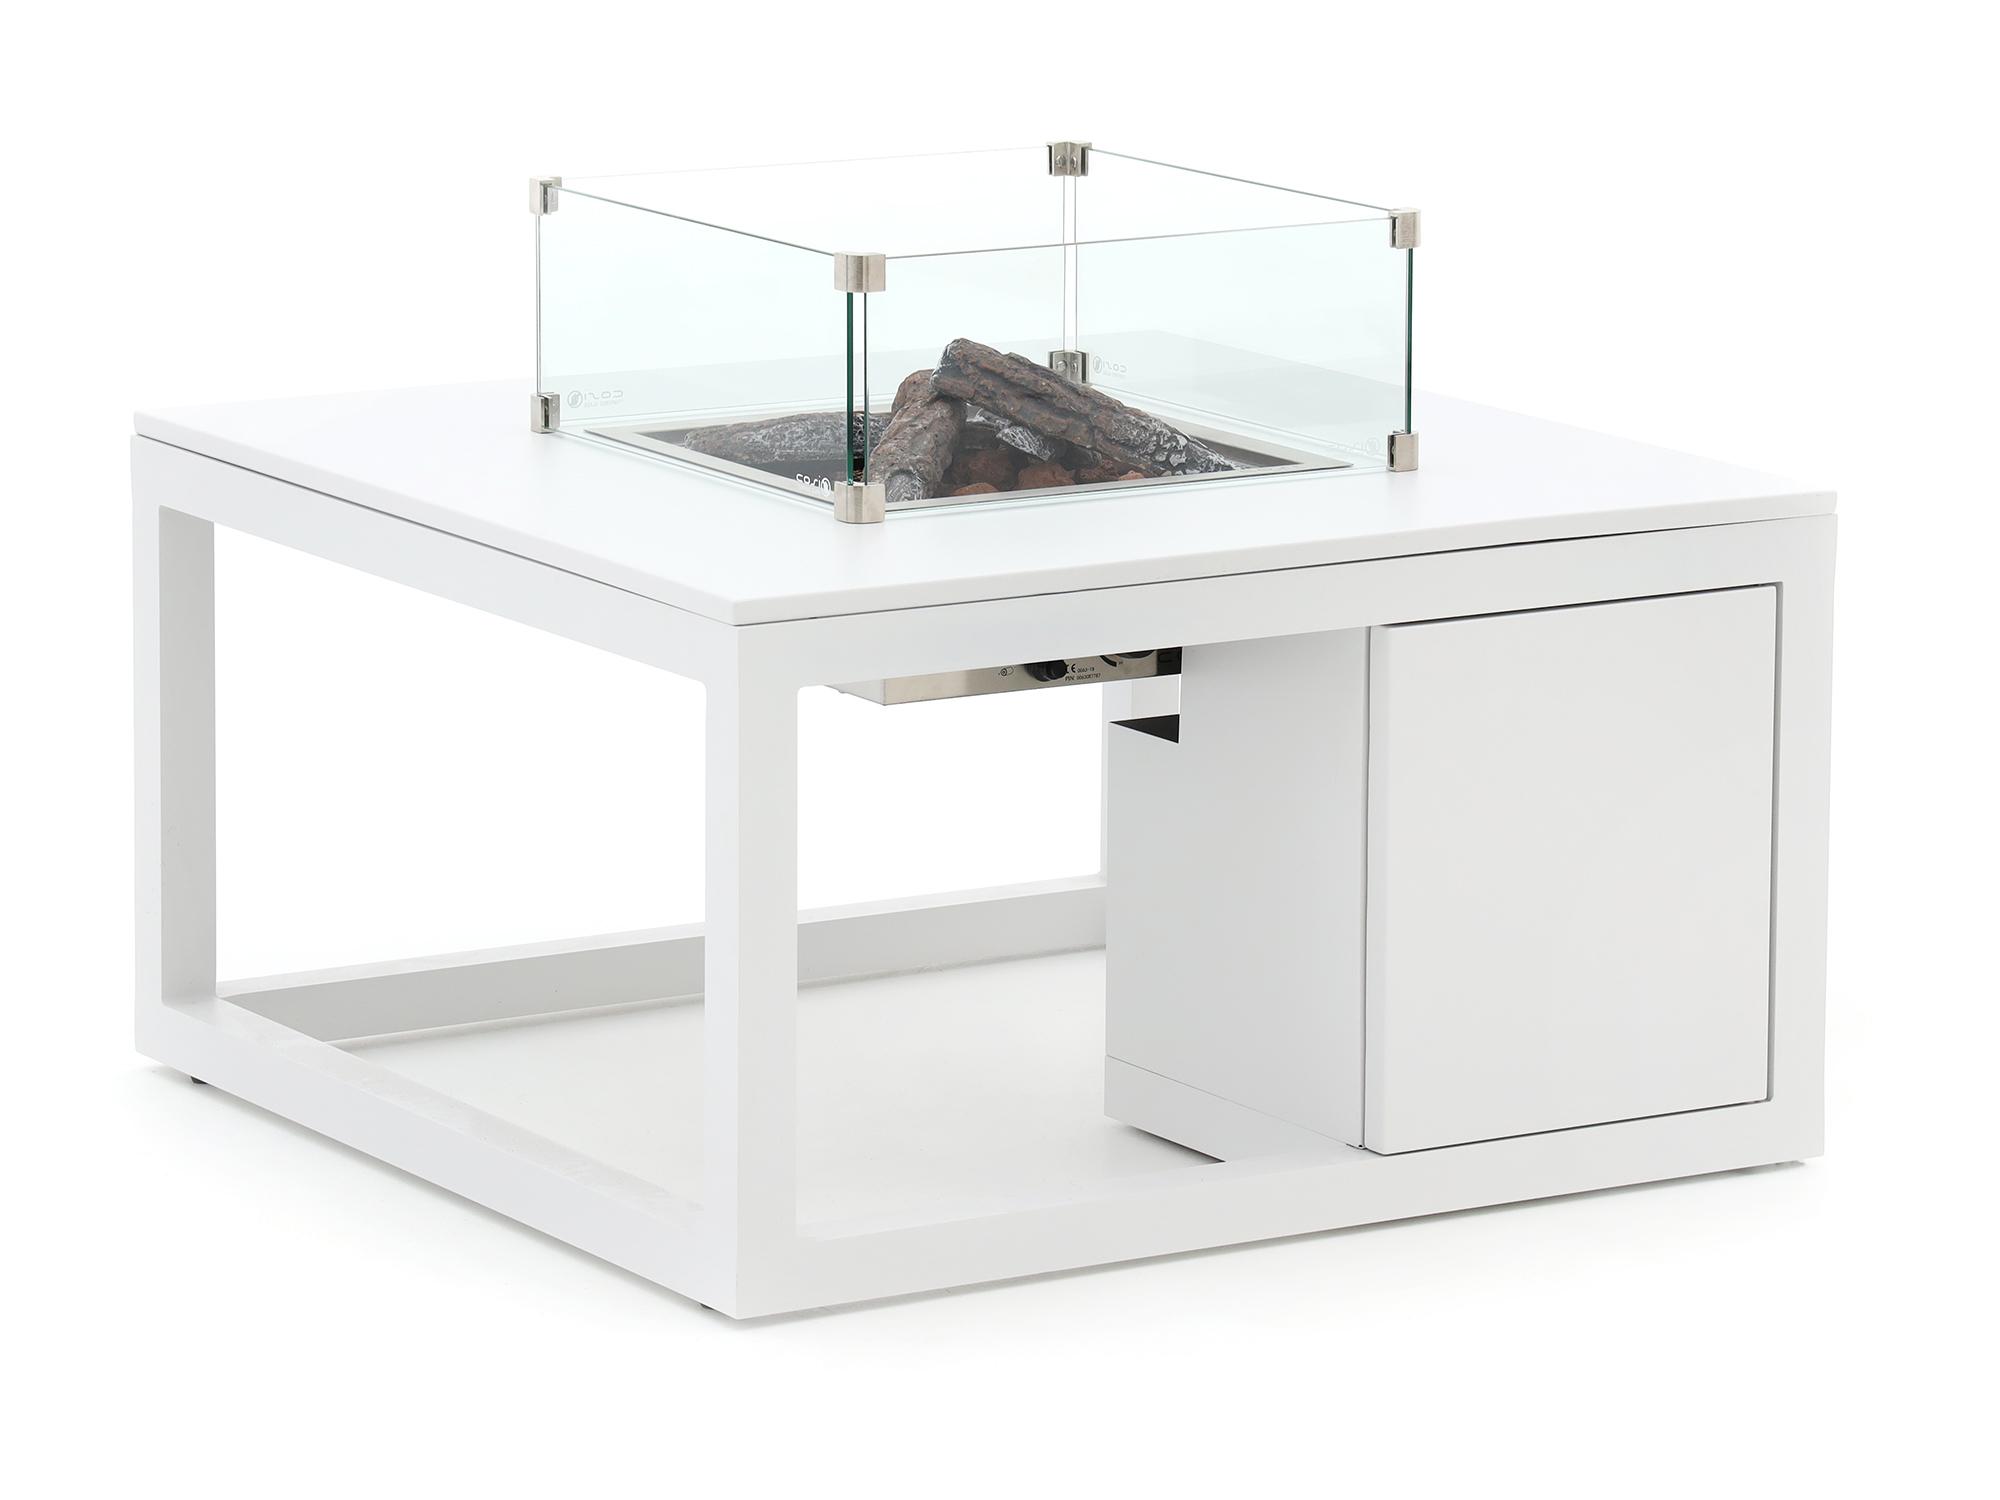 Cosiraw lounge vuurtafel 100x100x55cm - Laagste prijsgarantie!